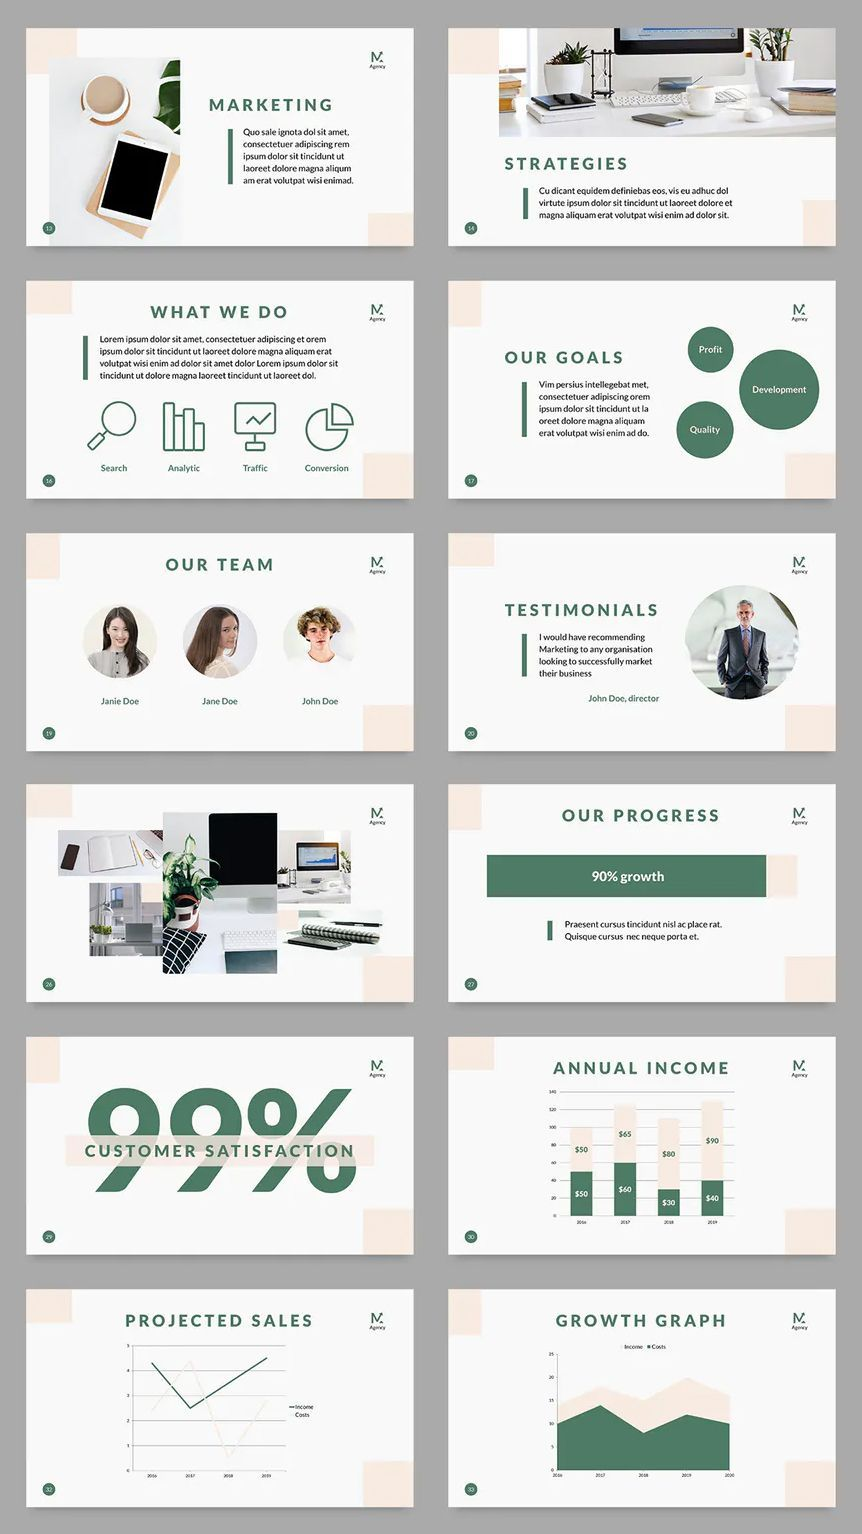 Digital Marketing Company PowerPoint Presentation Template  50 Unique Slidescompany